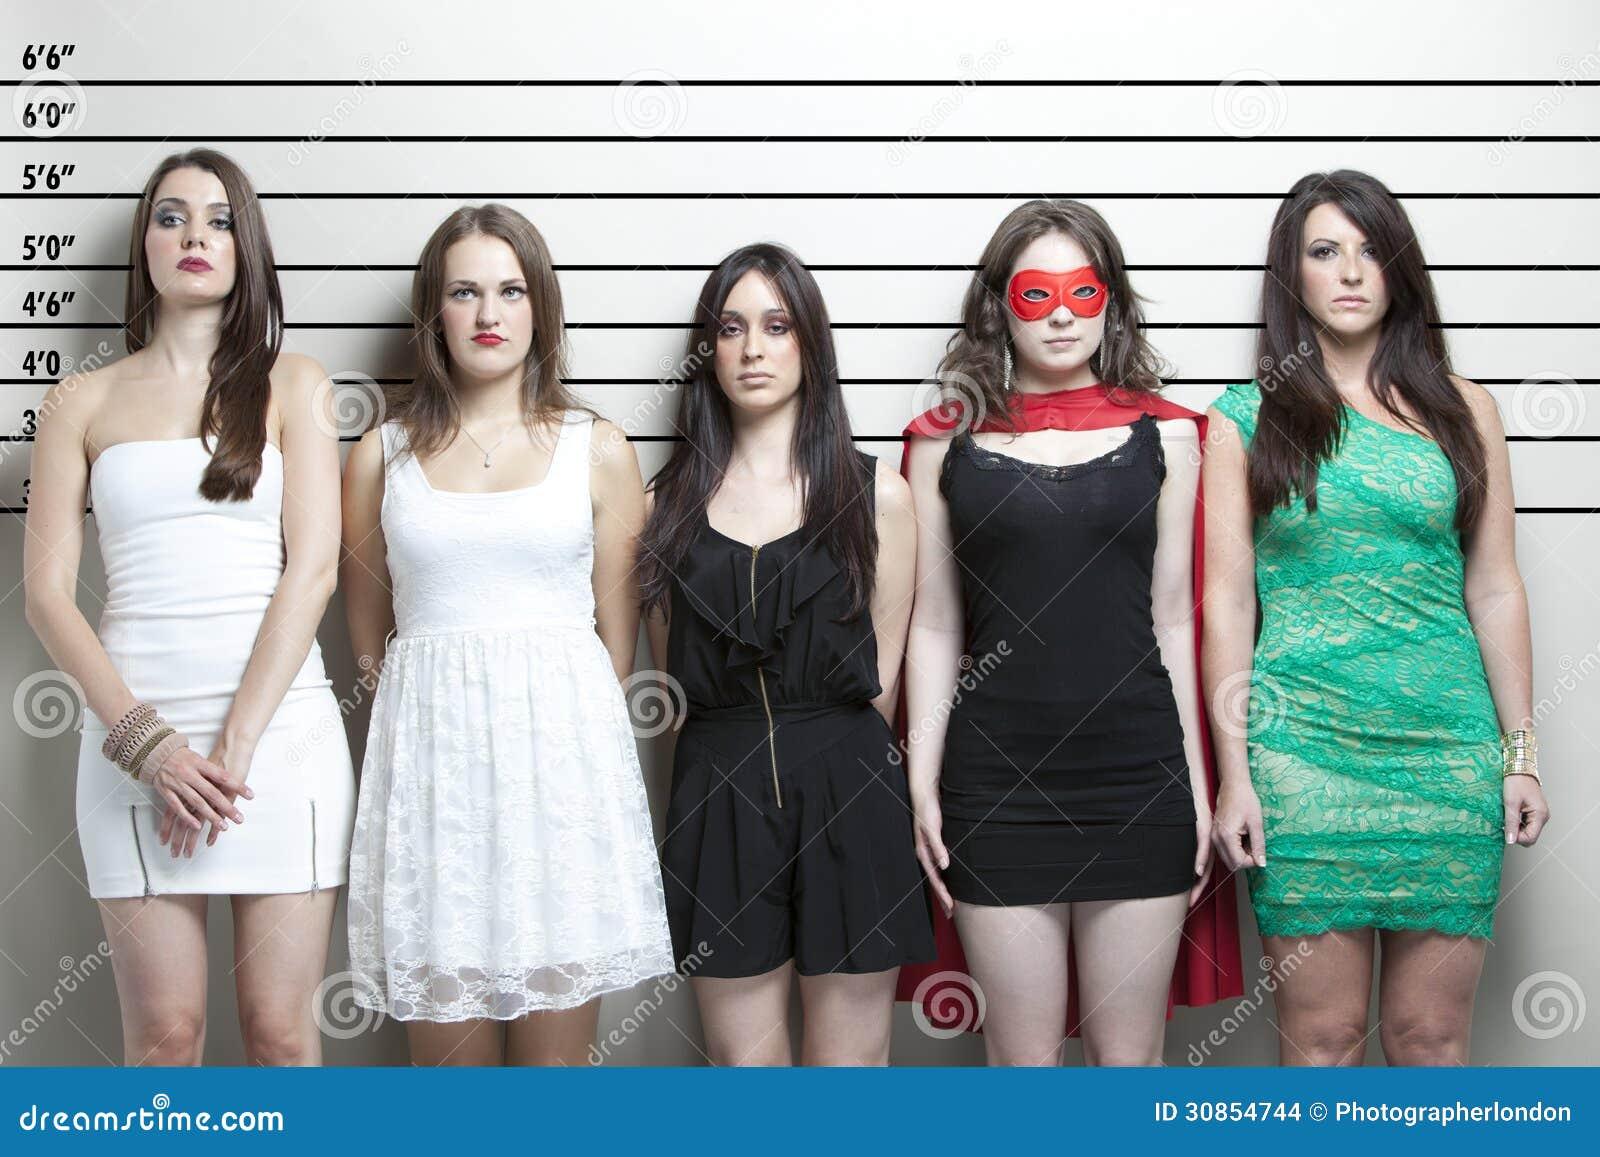 Women lineup online picture 34